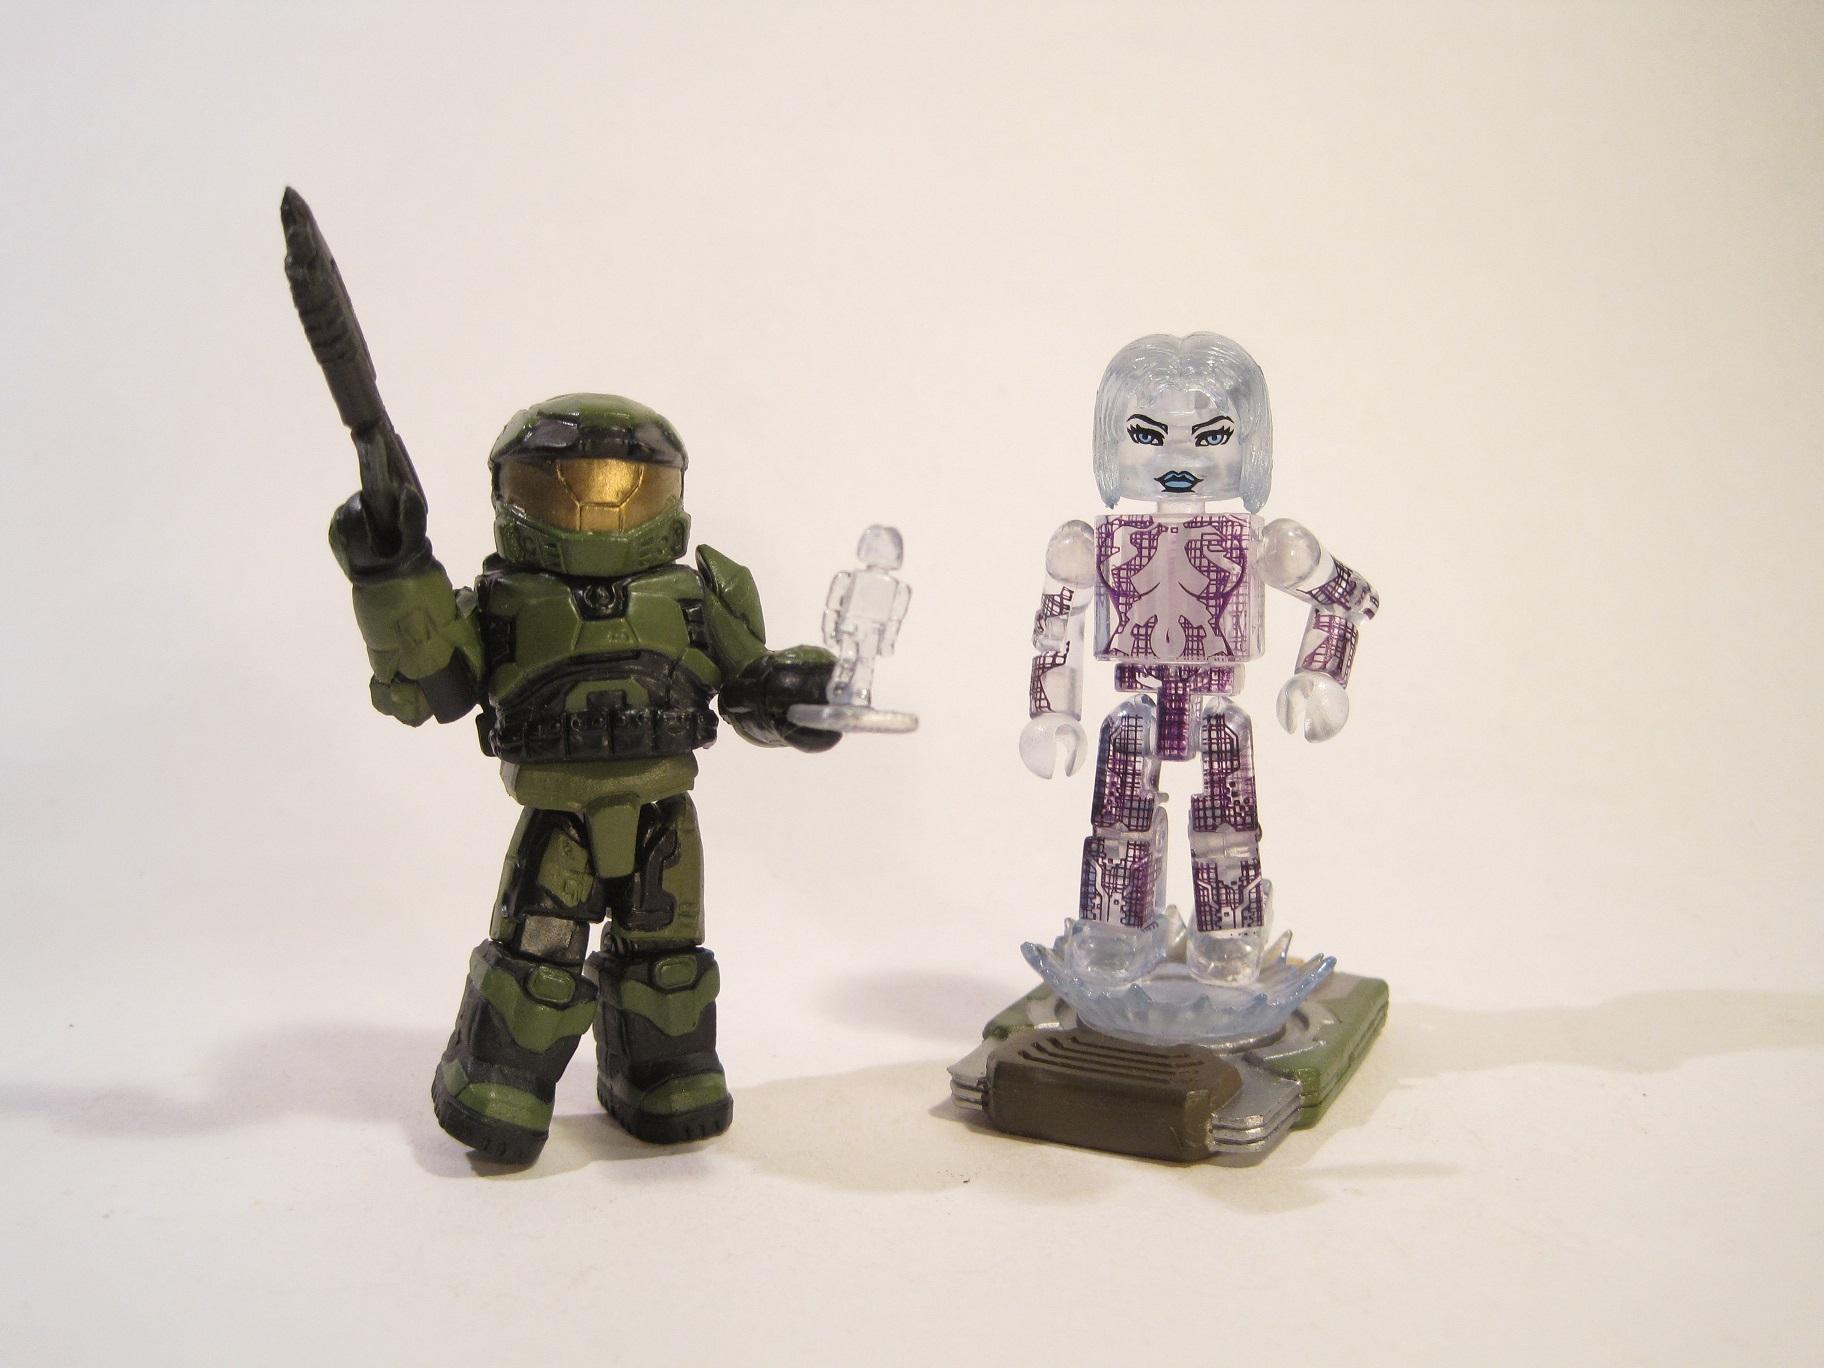 Halo Minimates Emile Halo Minimates Chief Amp Cortana1